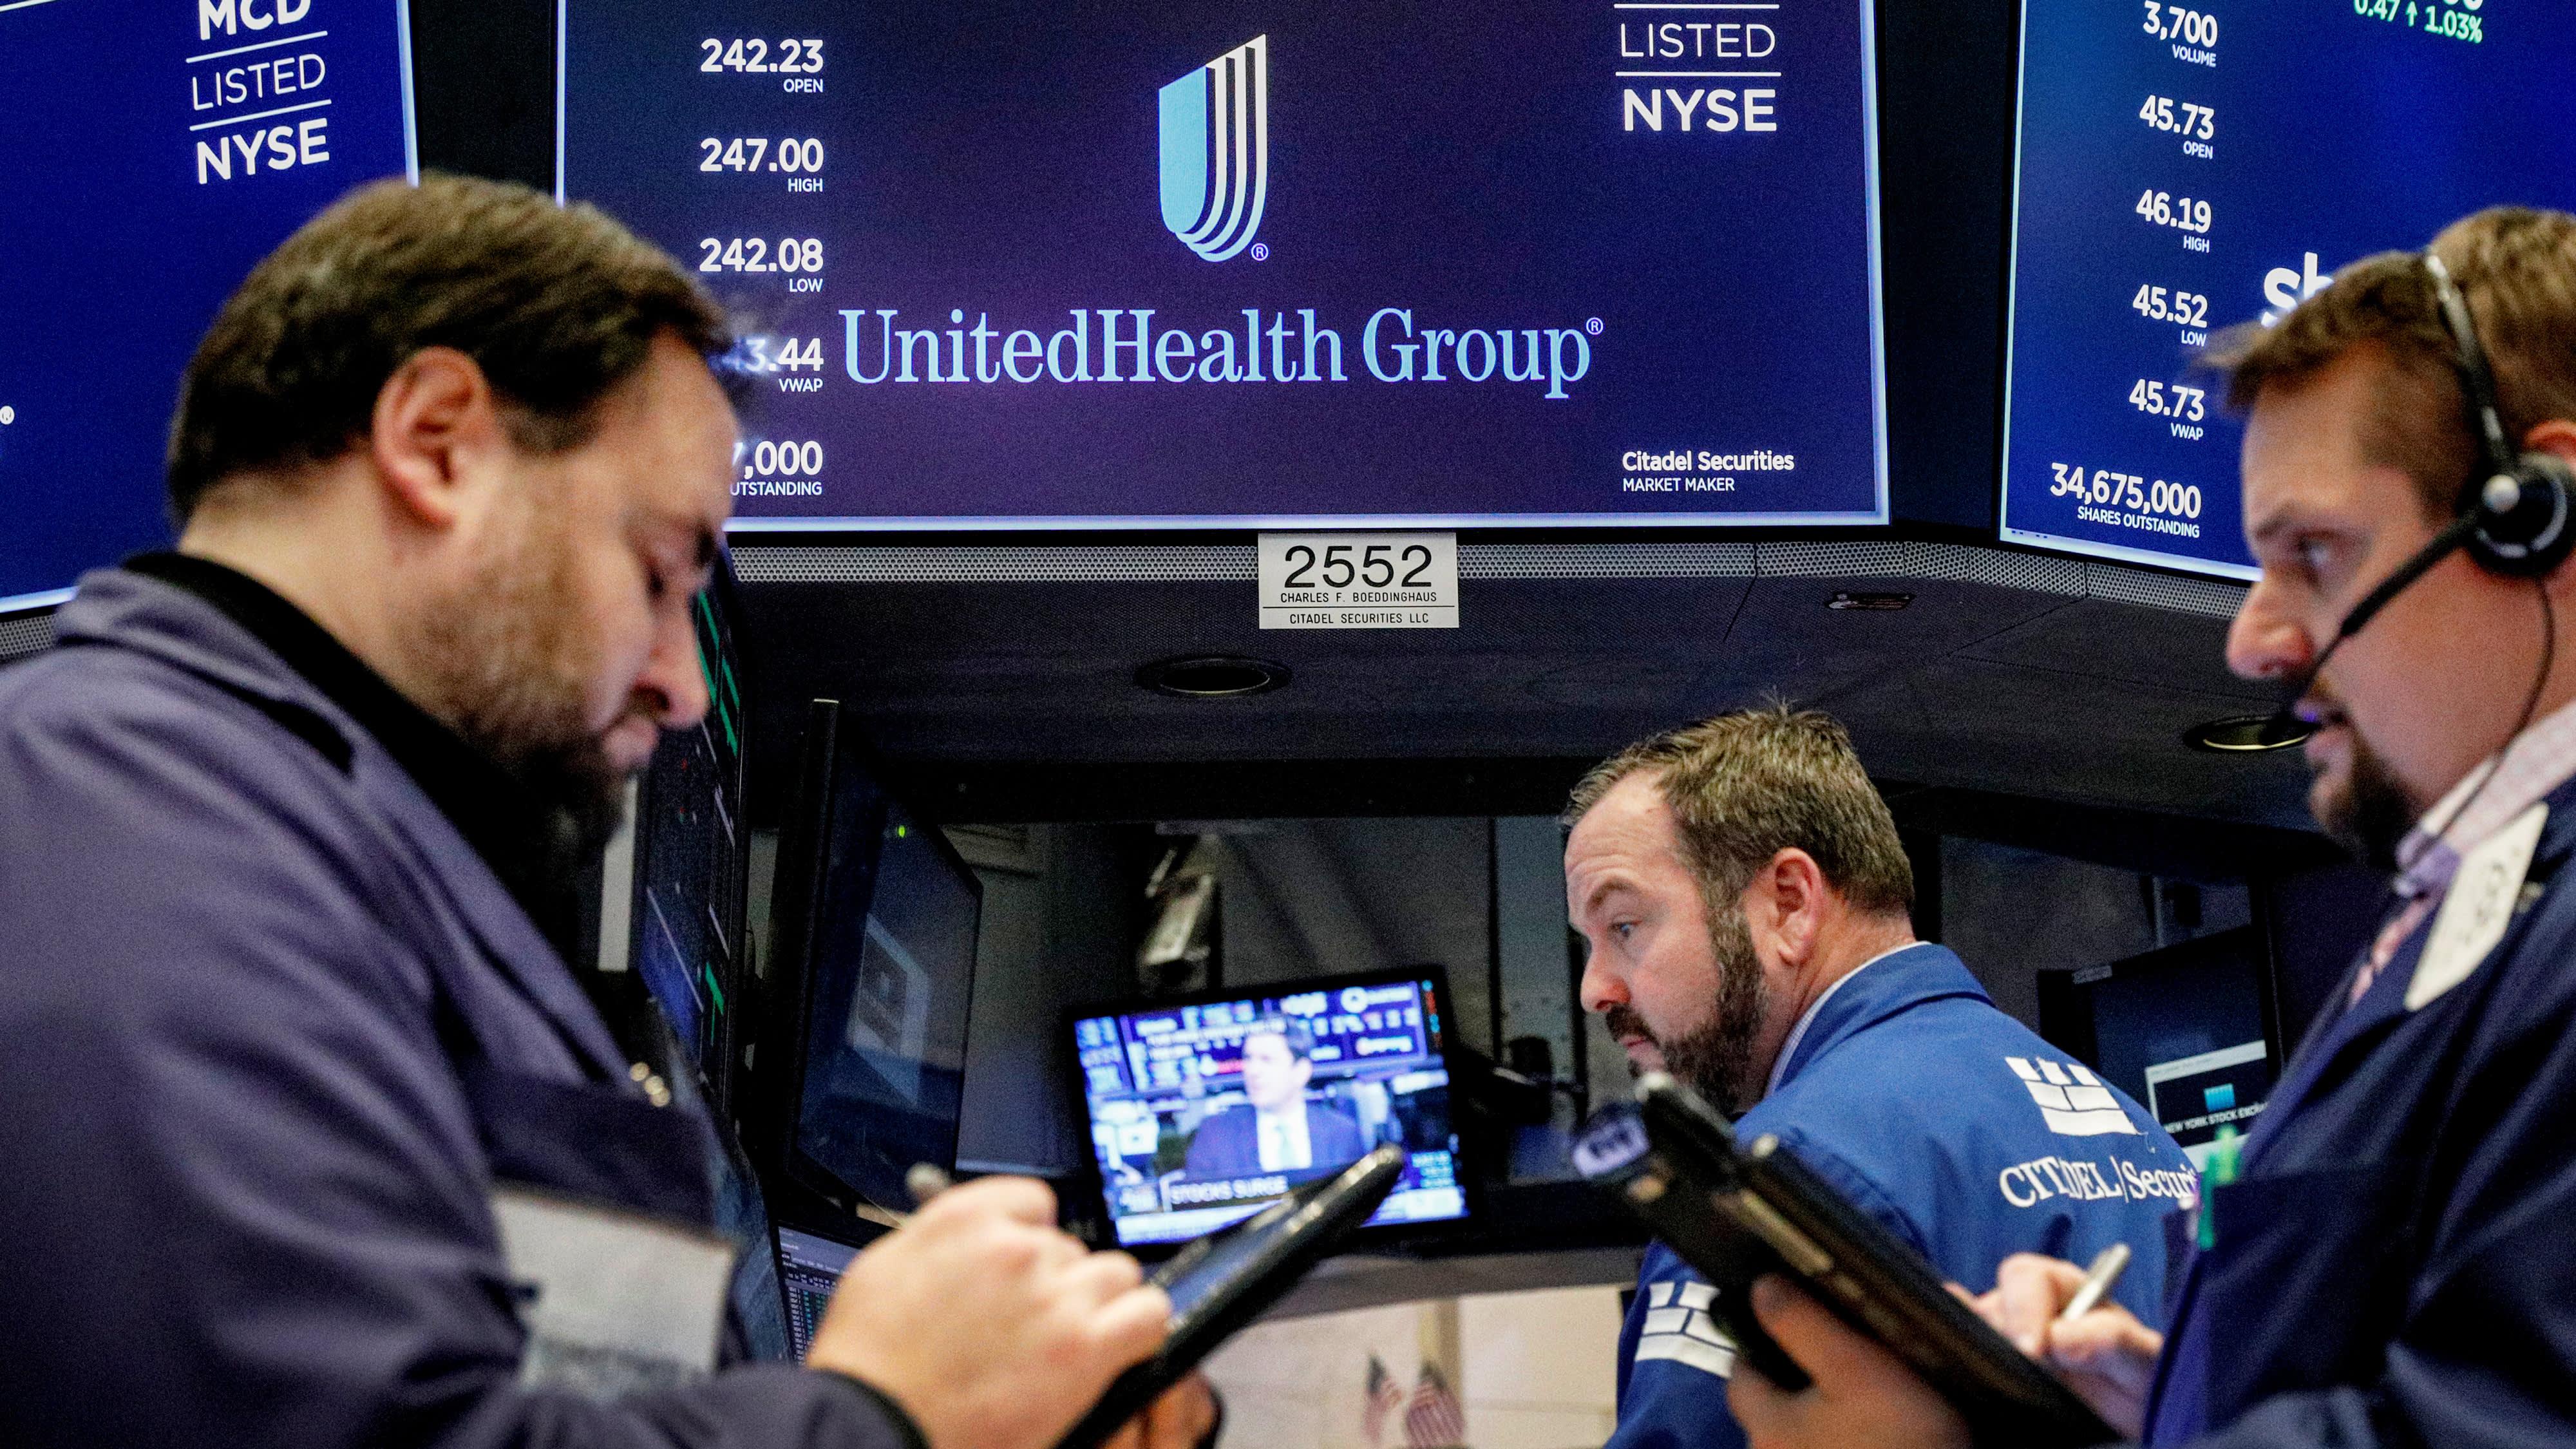 Healthcare stocks are making a comeback, says Jim Cramer